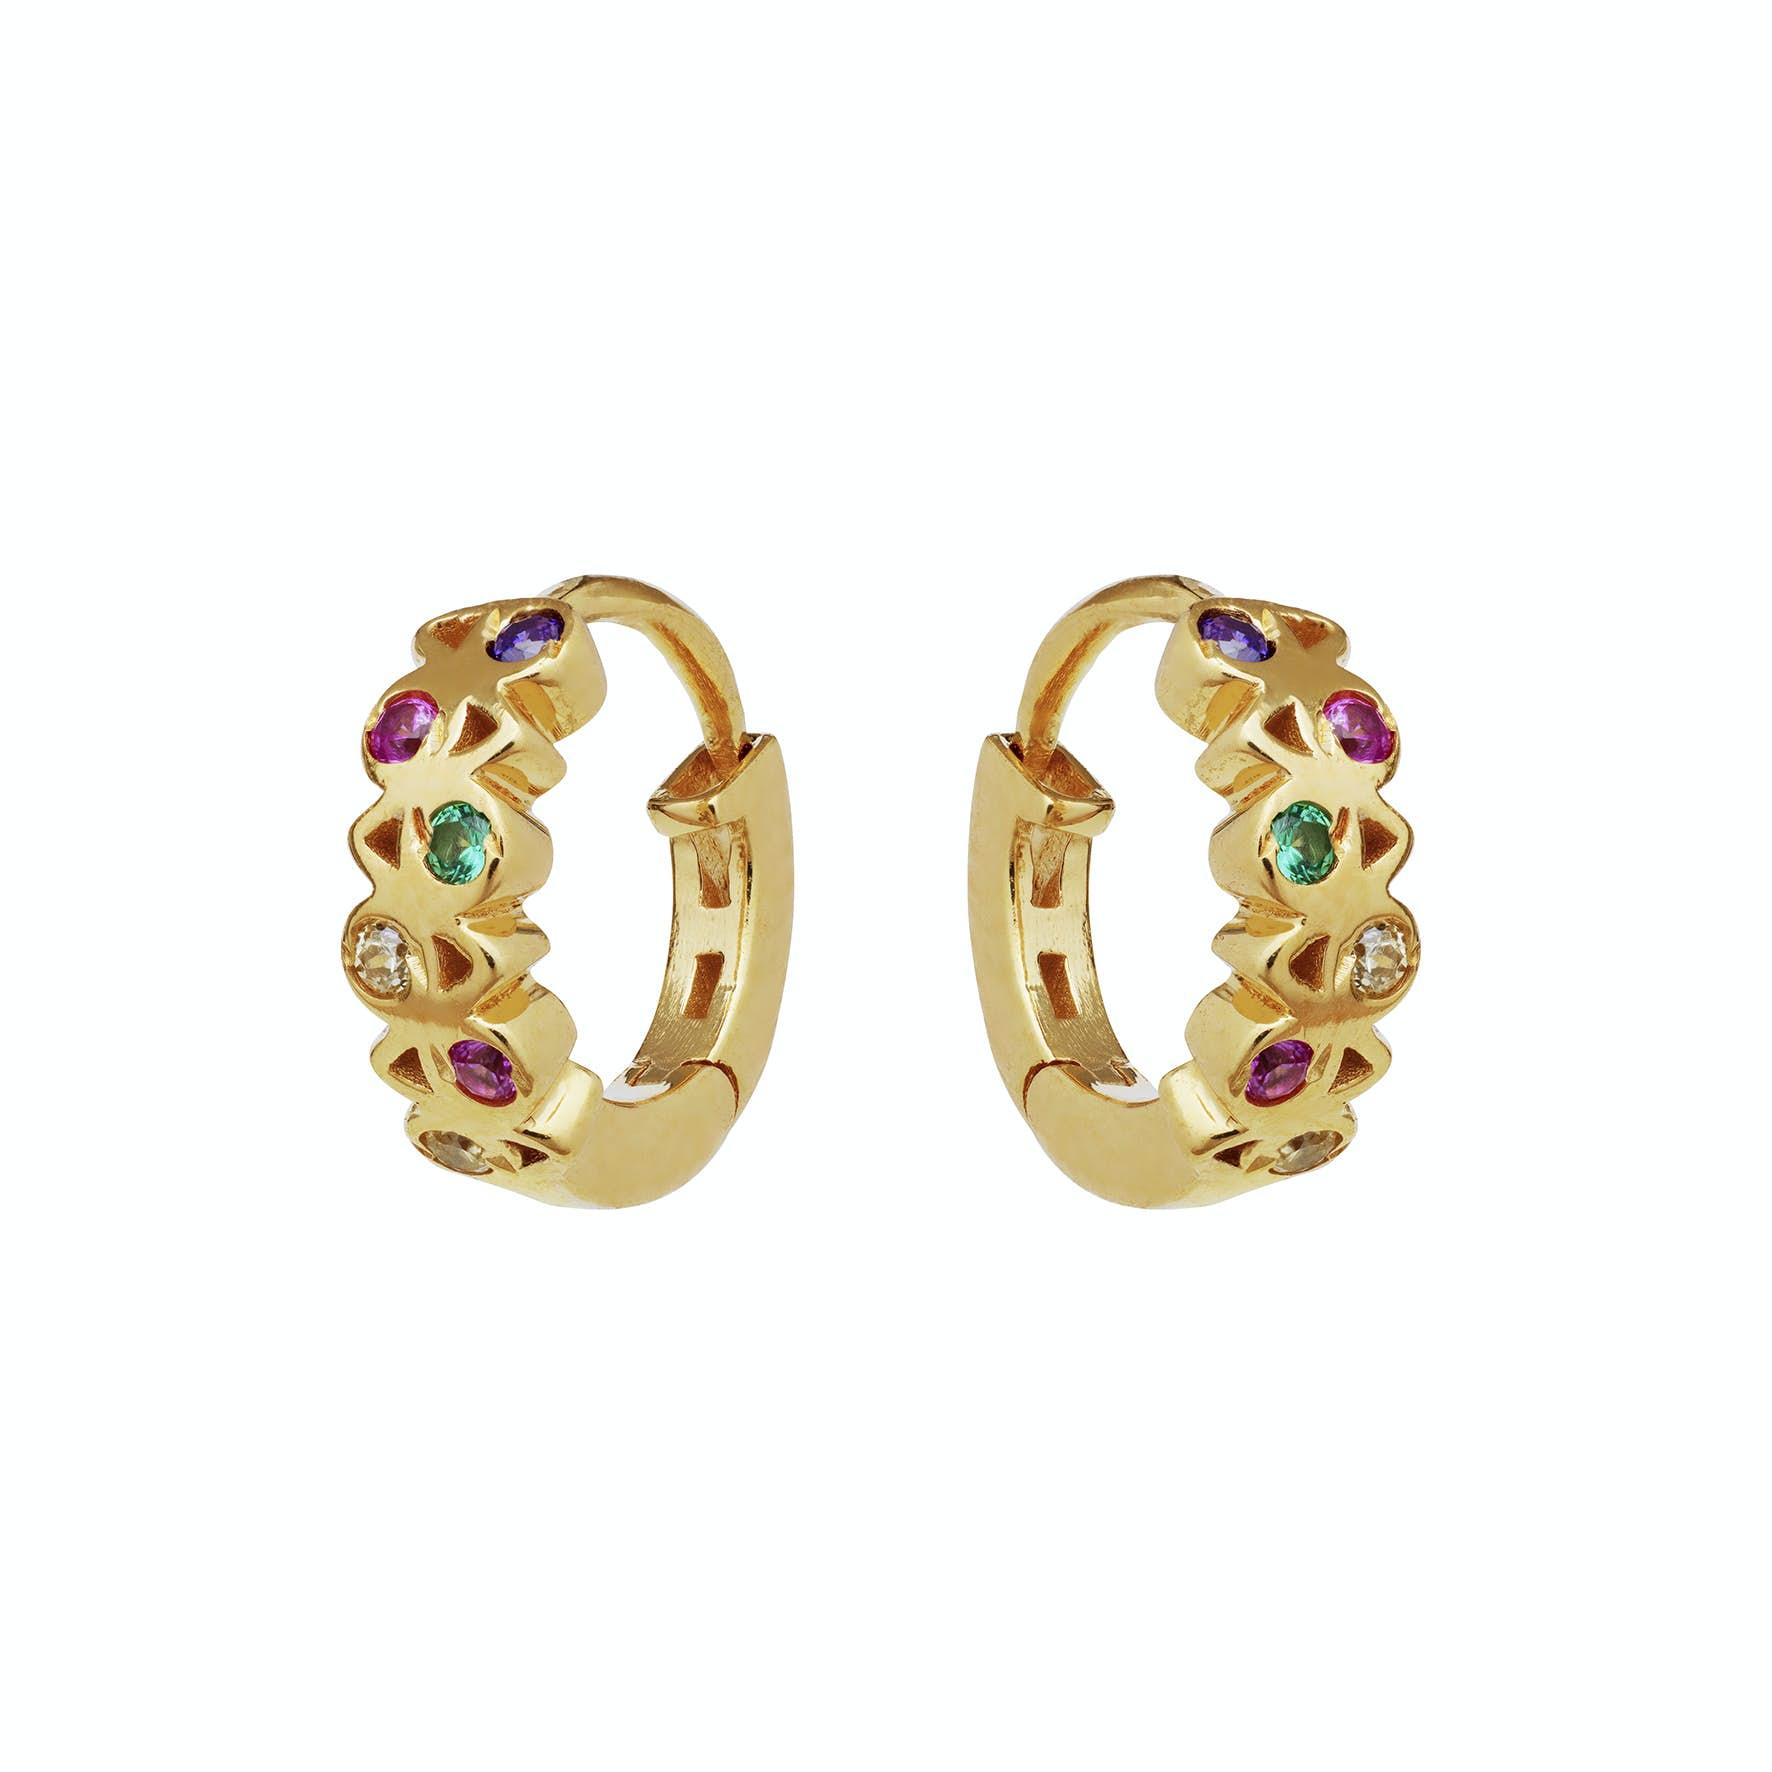 Dara Earrings from Maanesten in Goldplated-Silver Sterling 925